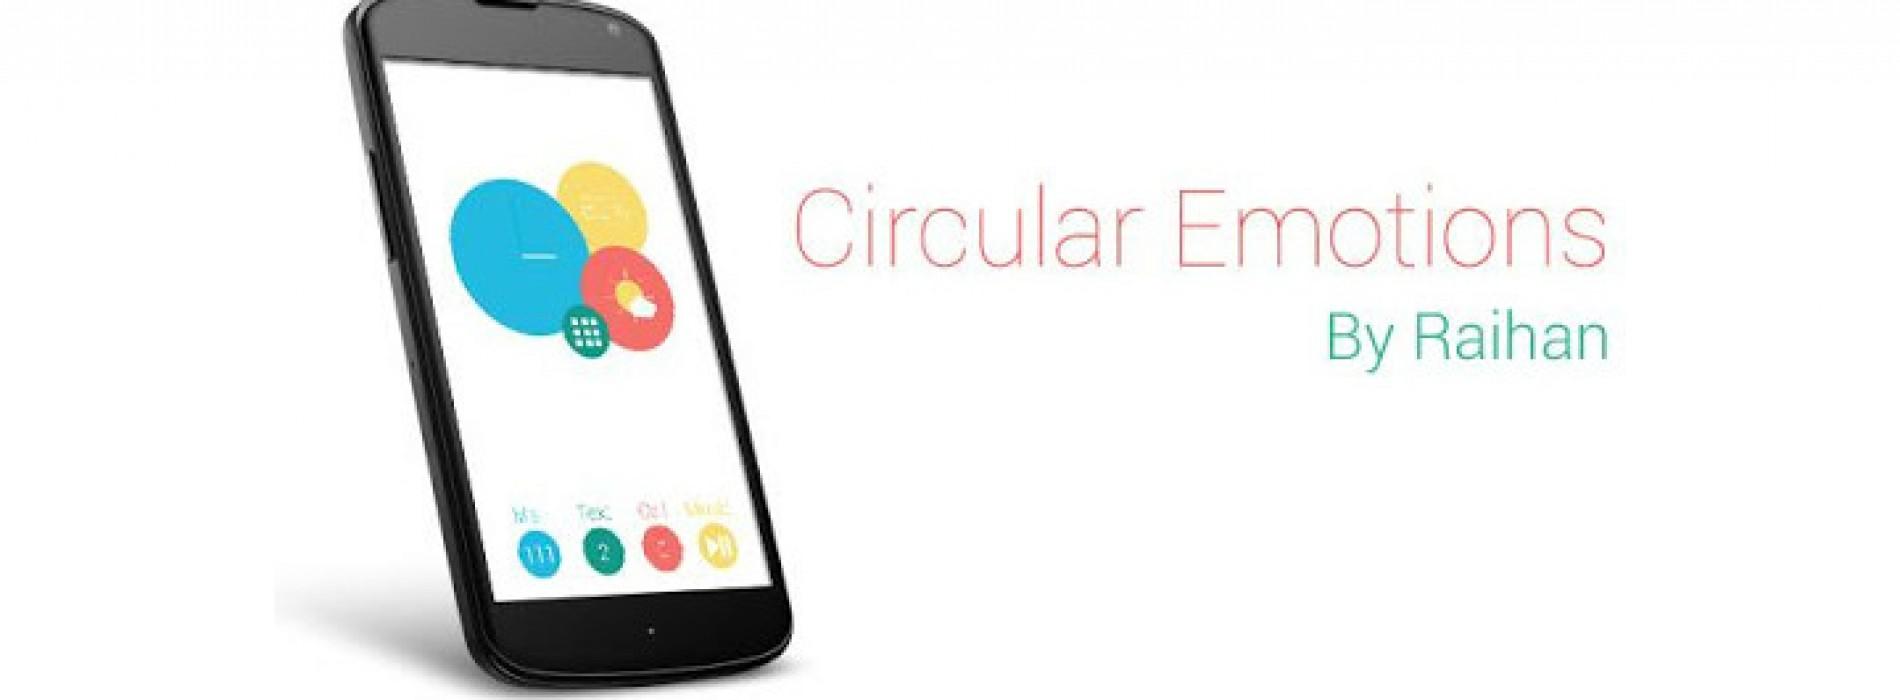 Get This Look: Circular Emotions